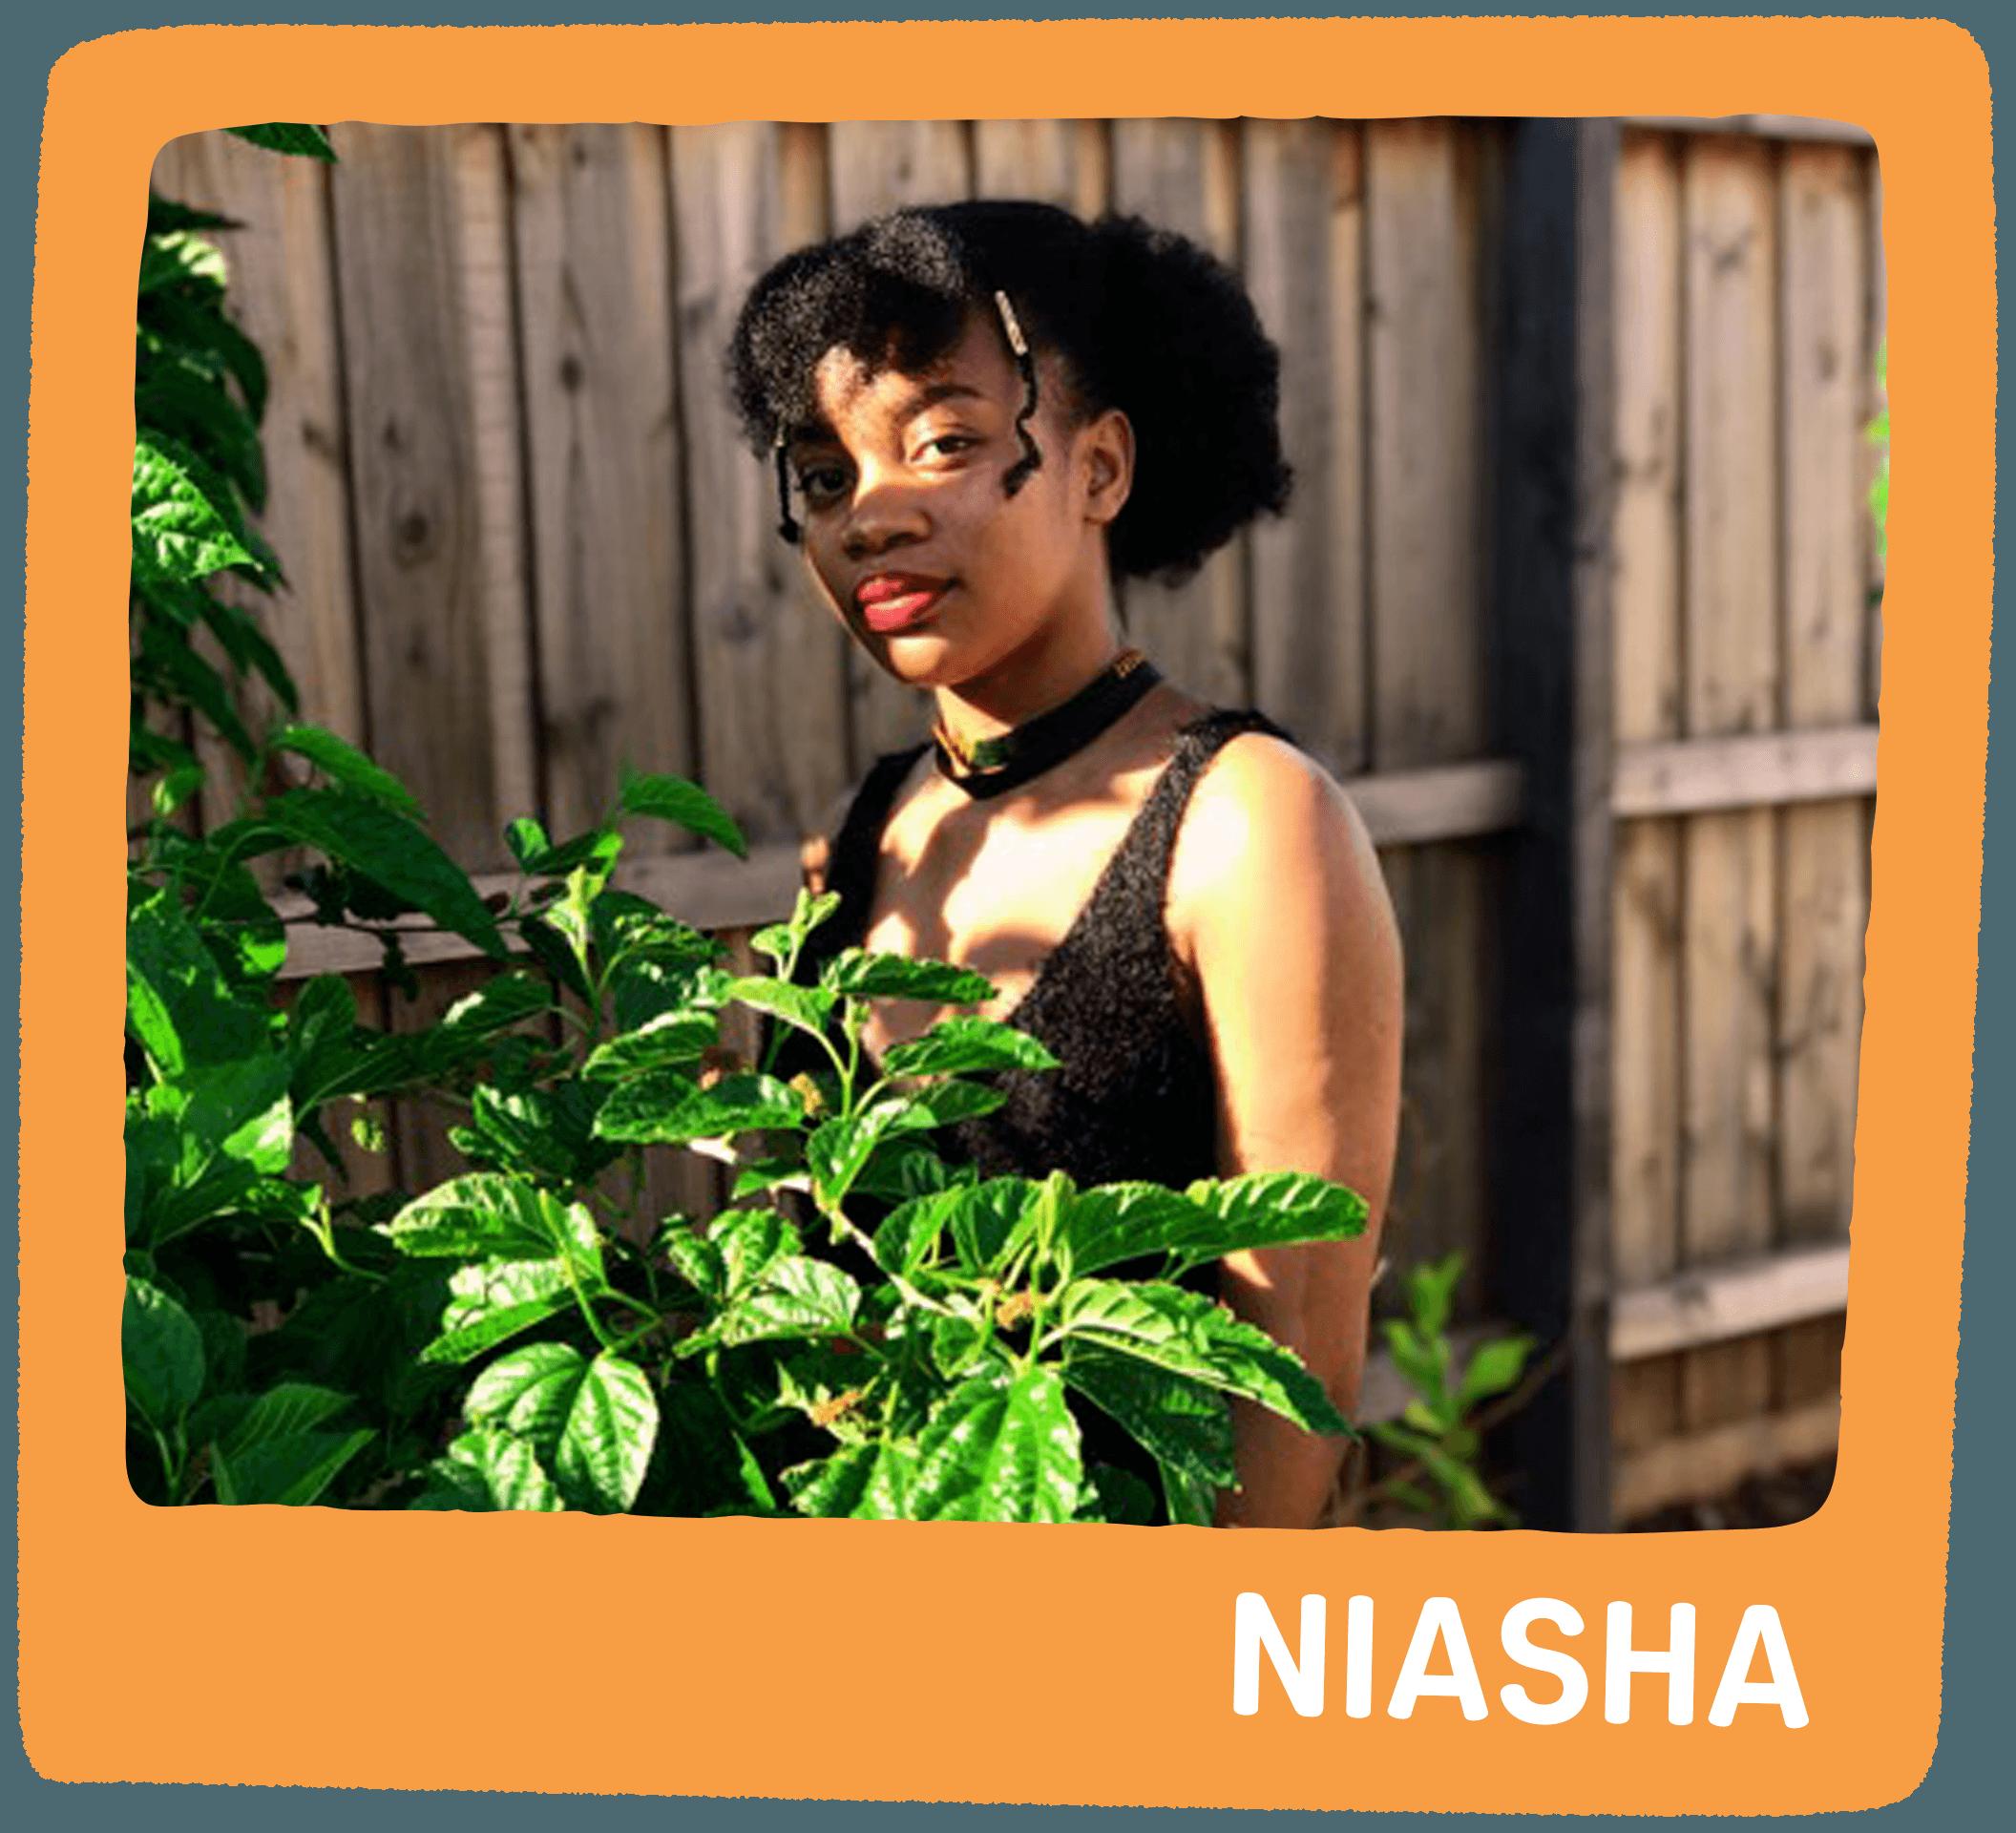 Niasha